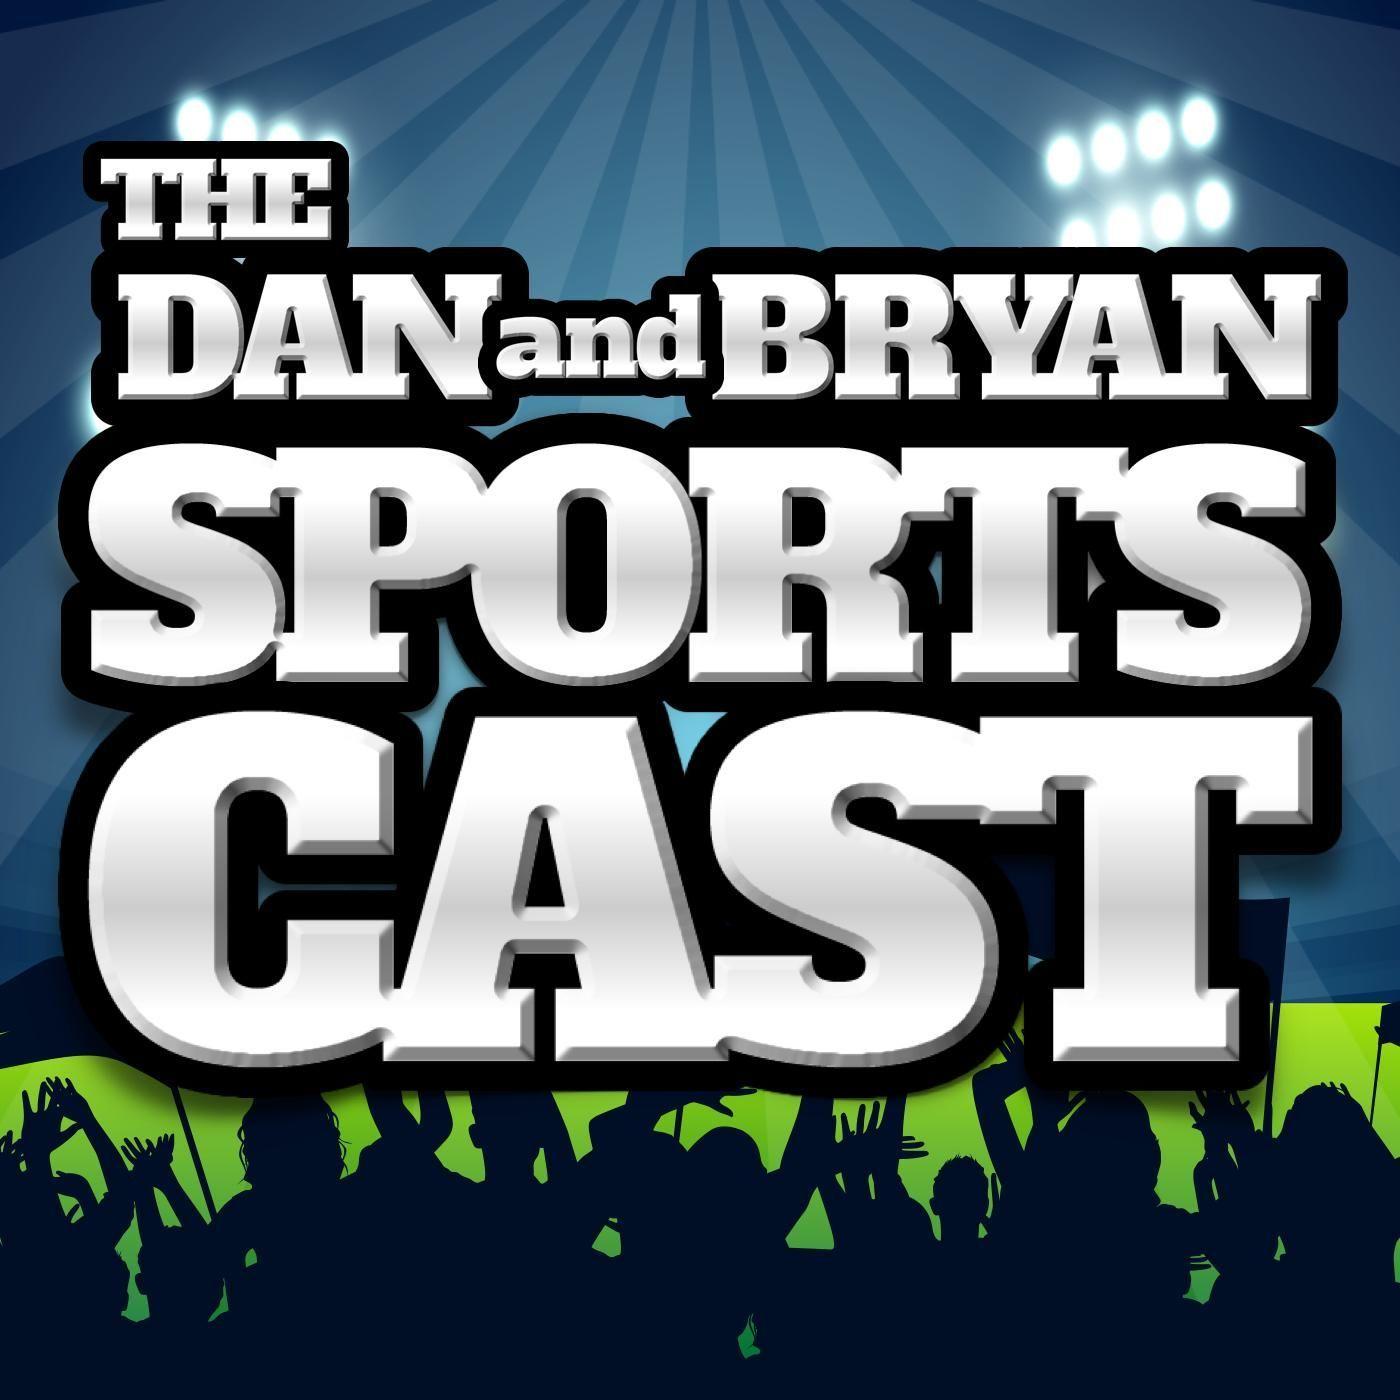 50: The Last Weeks Balls Episode